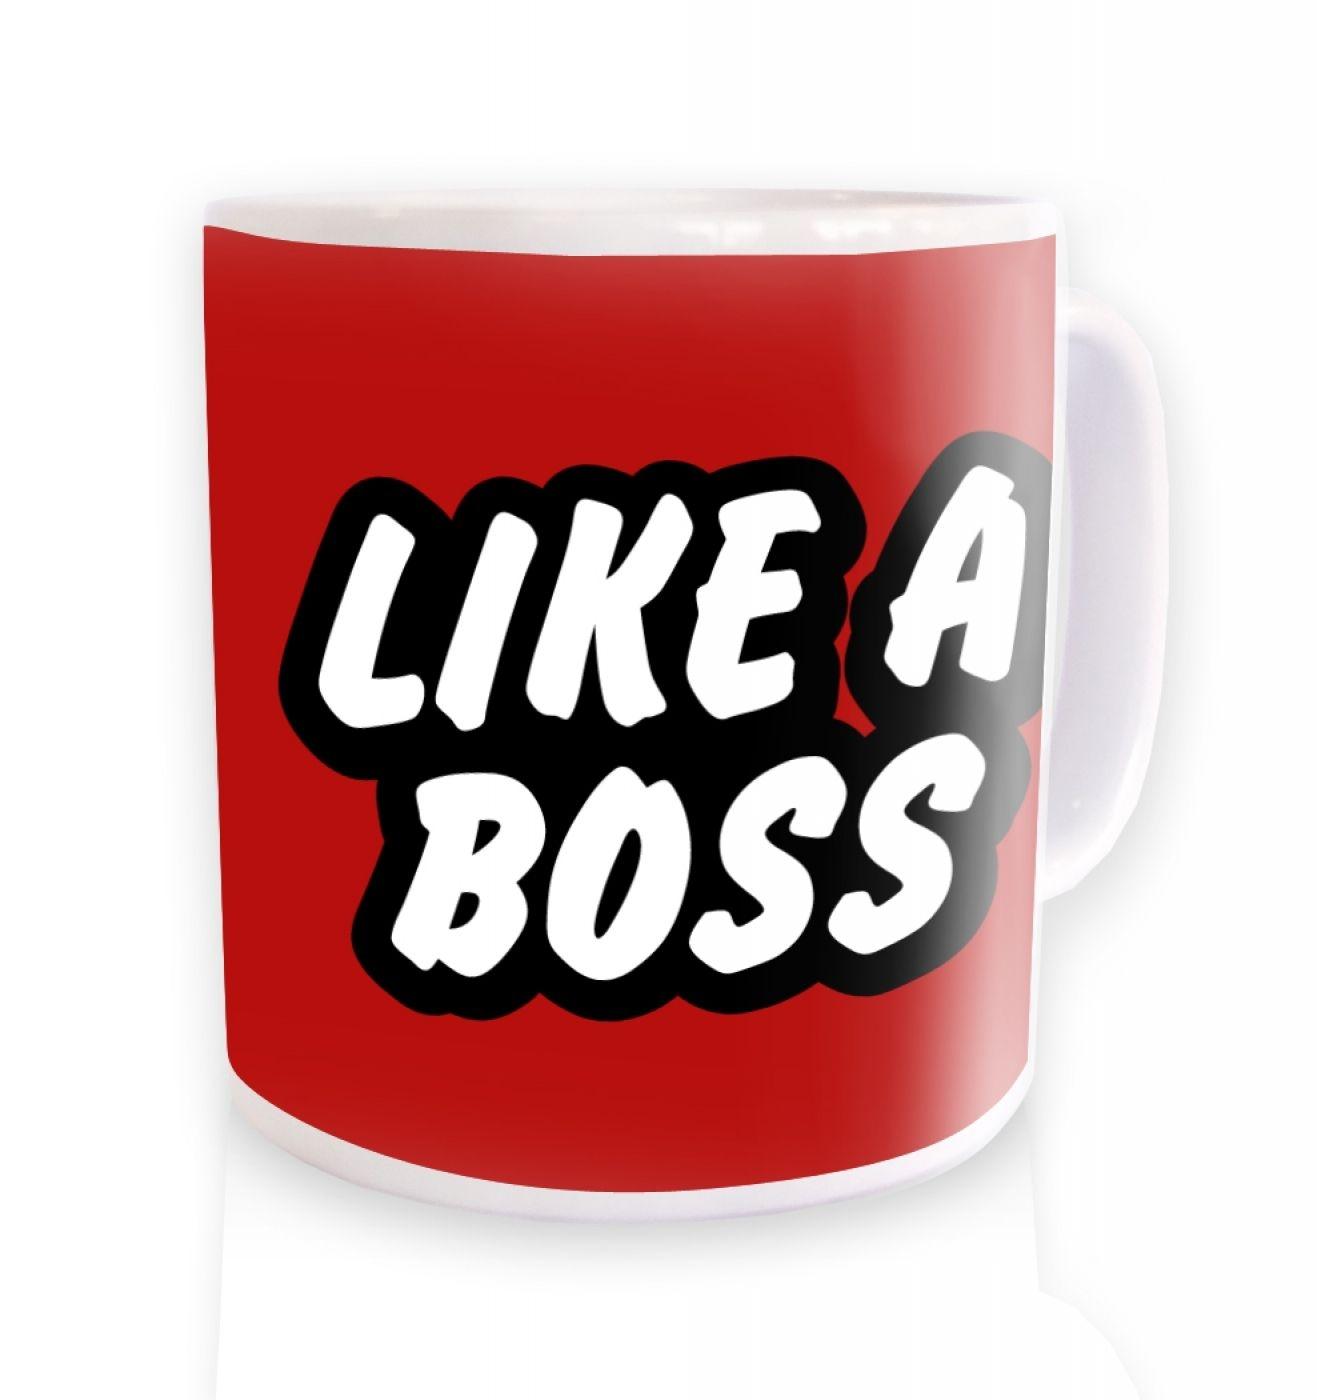 Like A Boss (red) ceramic coffee mug